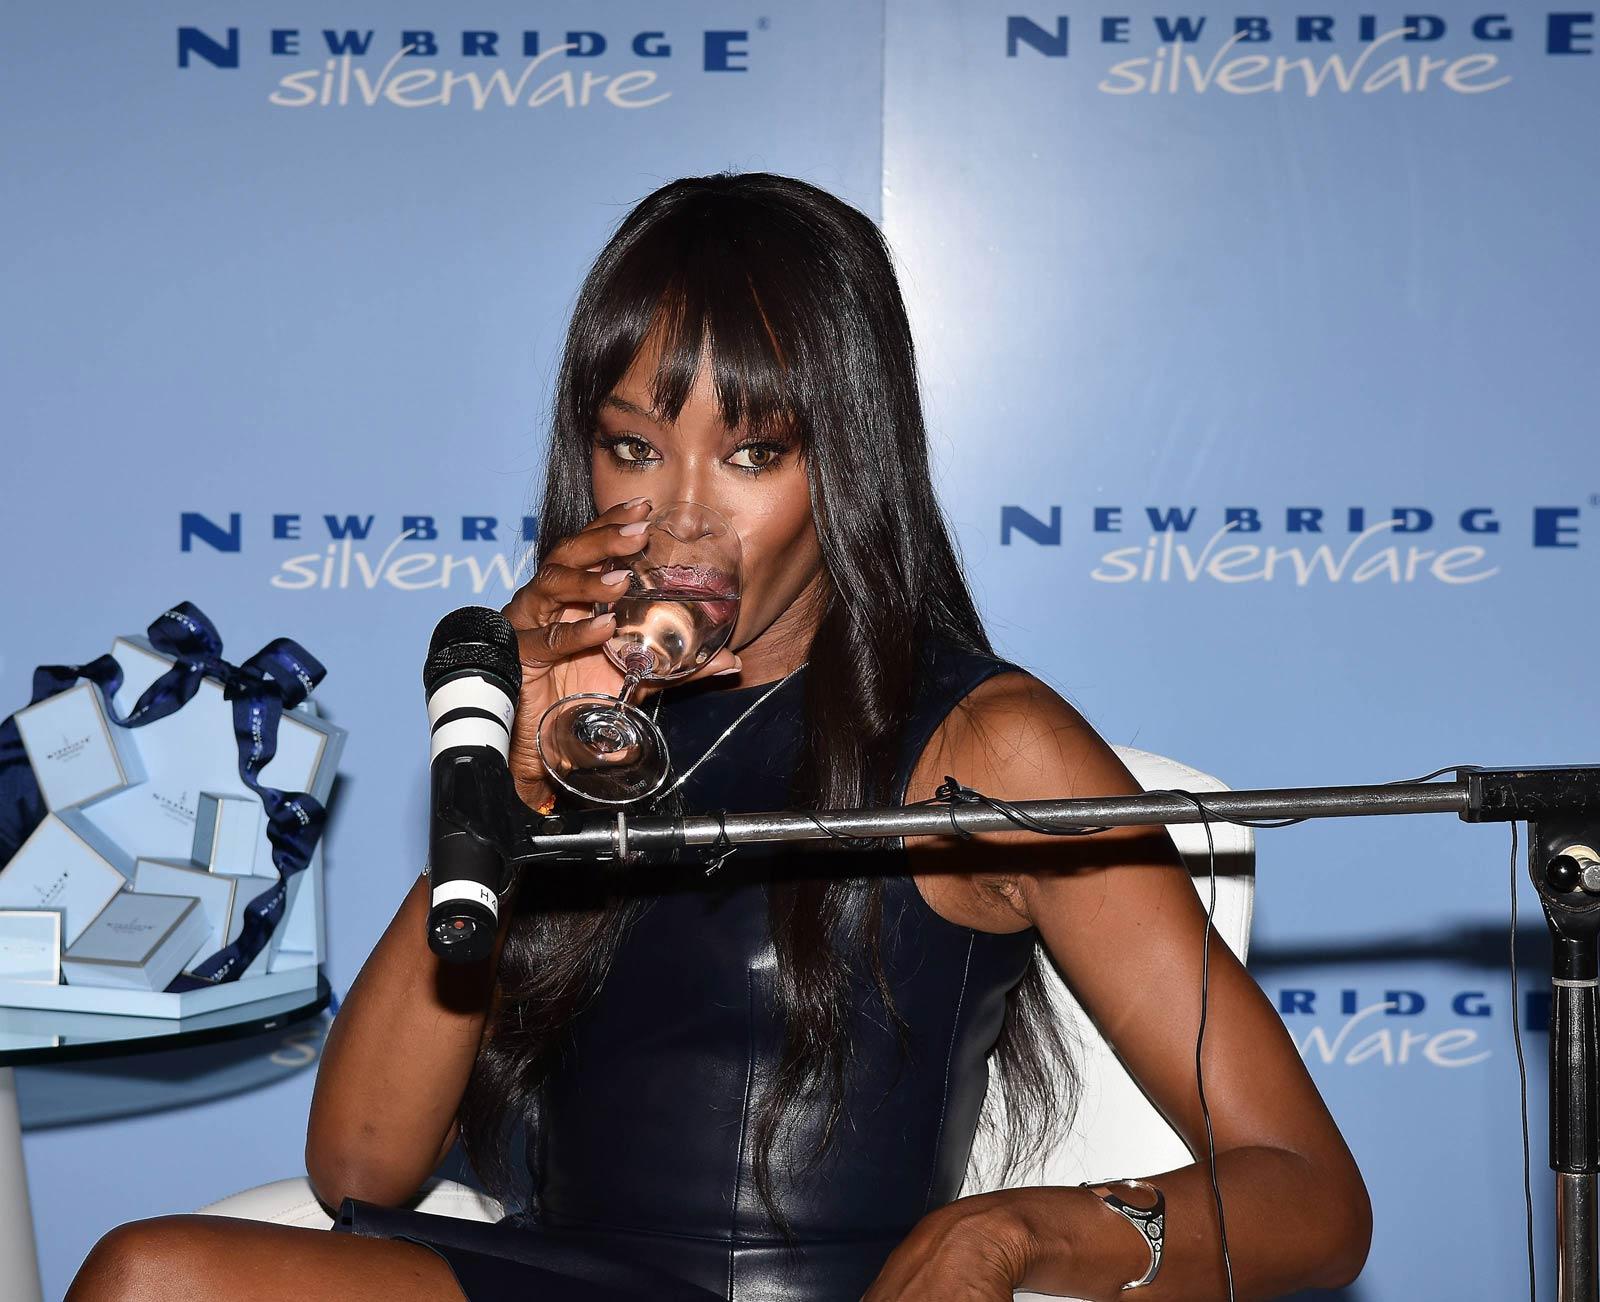 Naomi Campbell revealed as new face of Newbridge Silverware